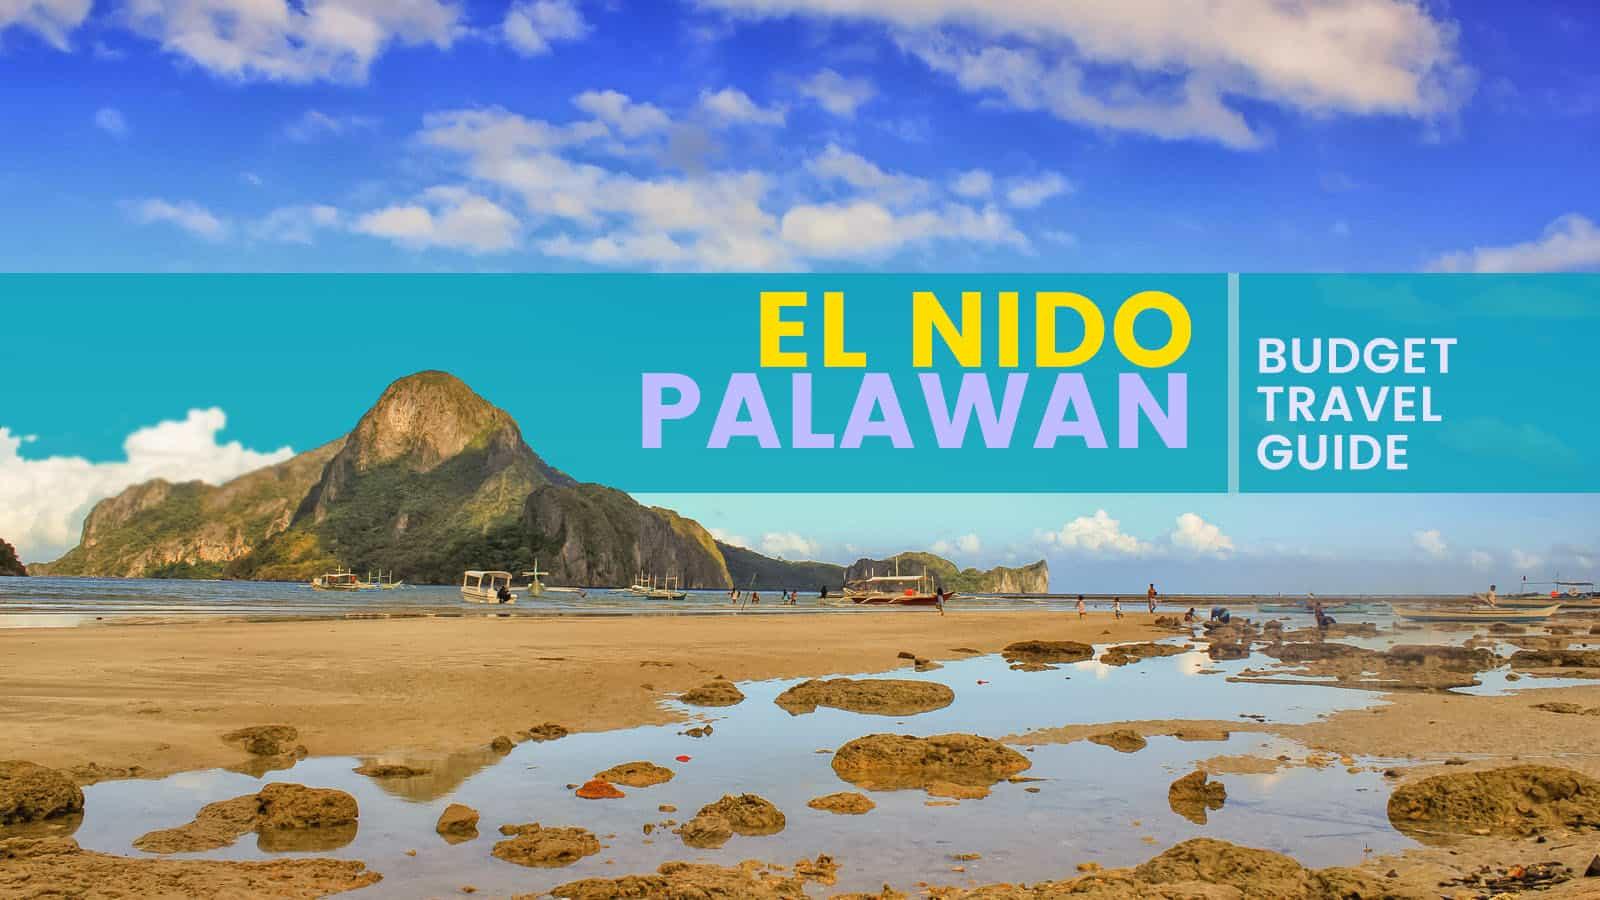 EL NIDO, PALAWAN: 预算旅游指南   穷游者的行程博客